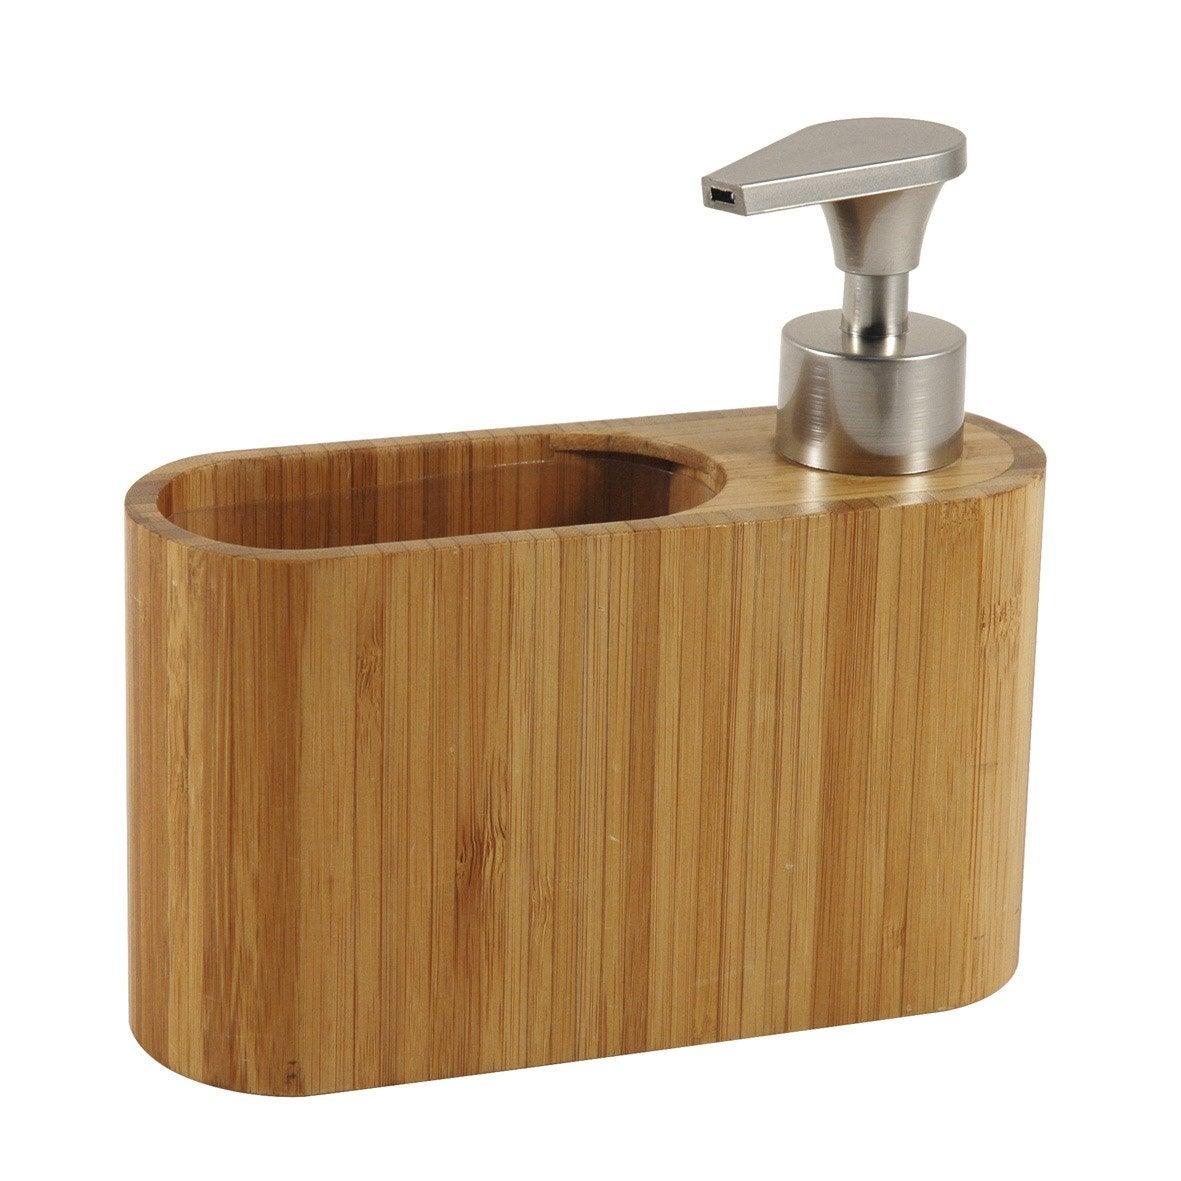 Distributeur de savon bambou, naturel